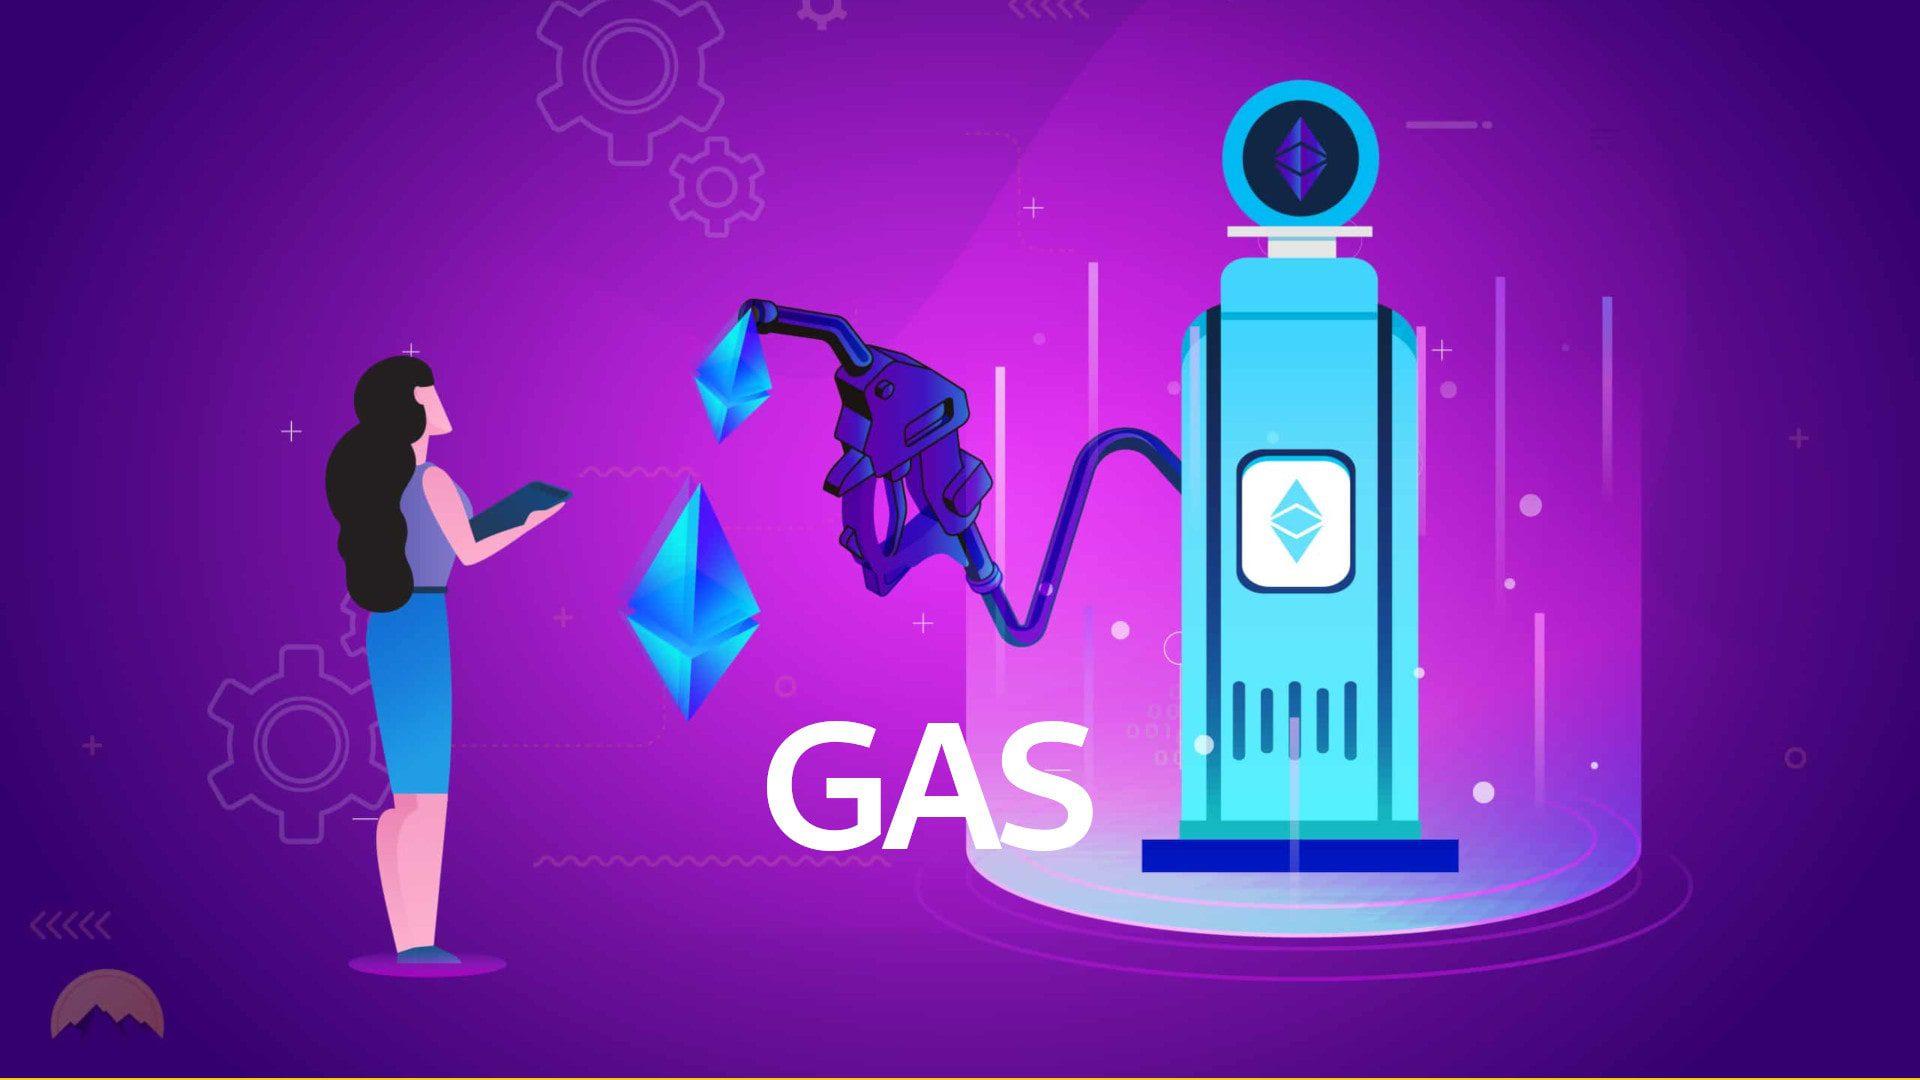 Qué es gas Ethereum Ether